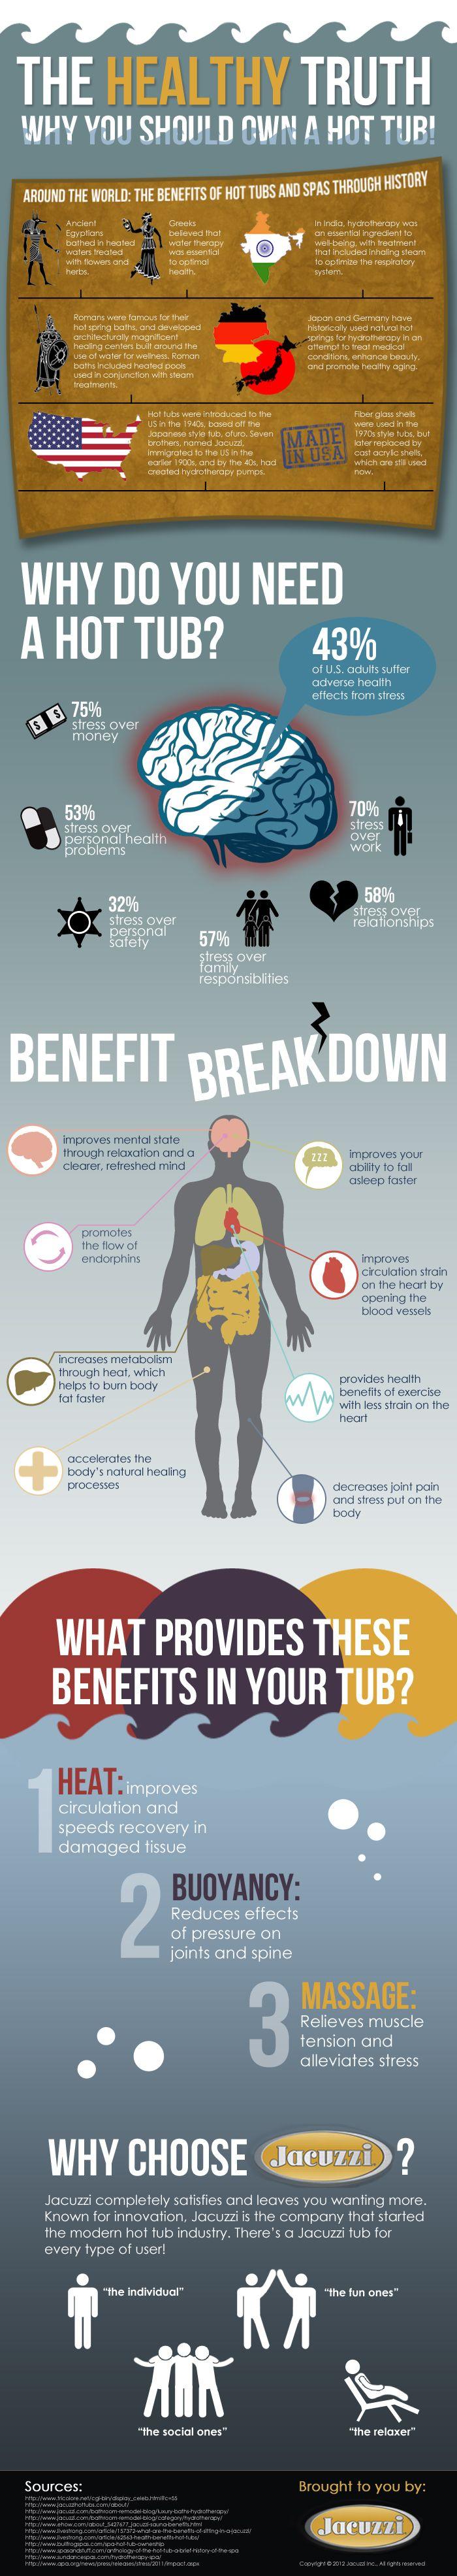 Got Stress? Get a Hot Tub. - Jacuzzi Hot Tub Infographic